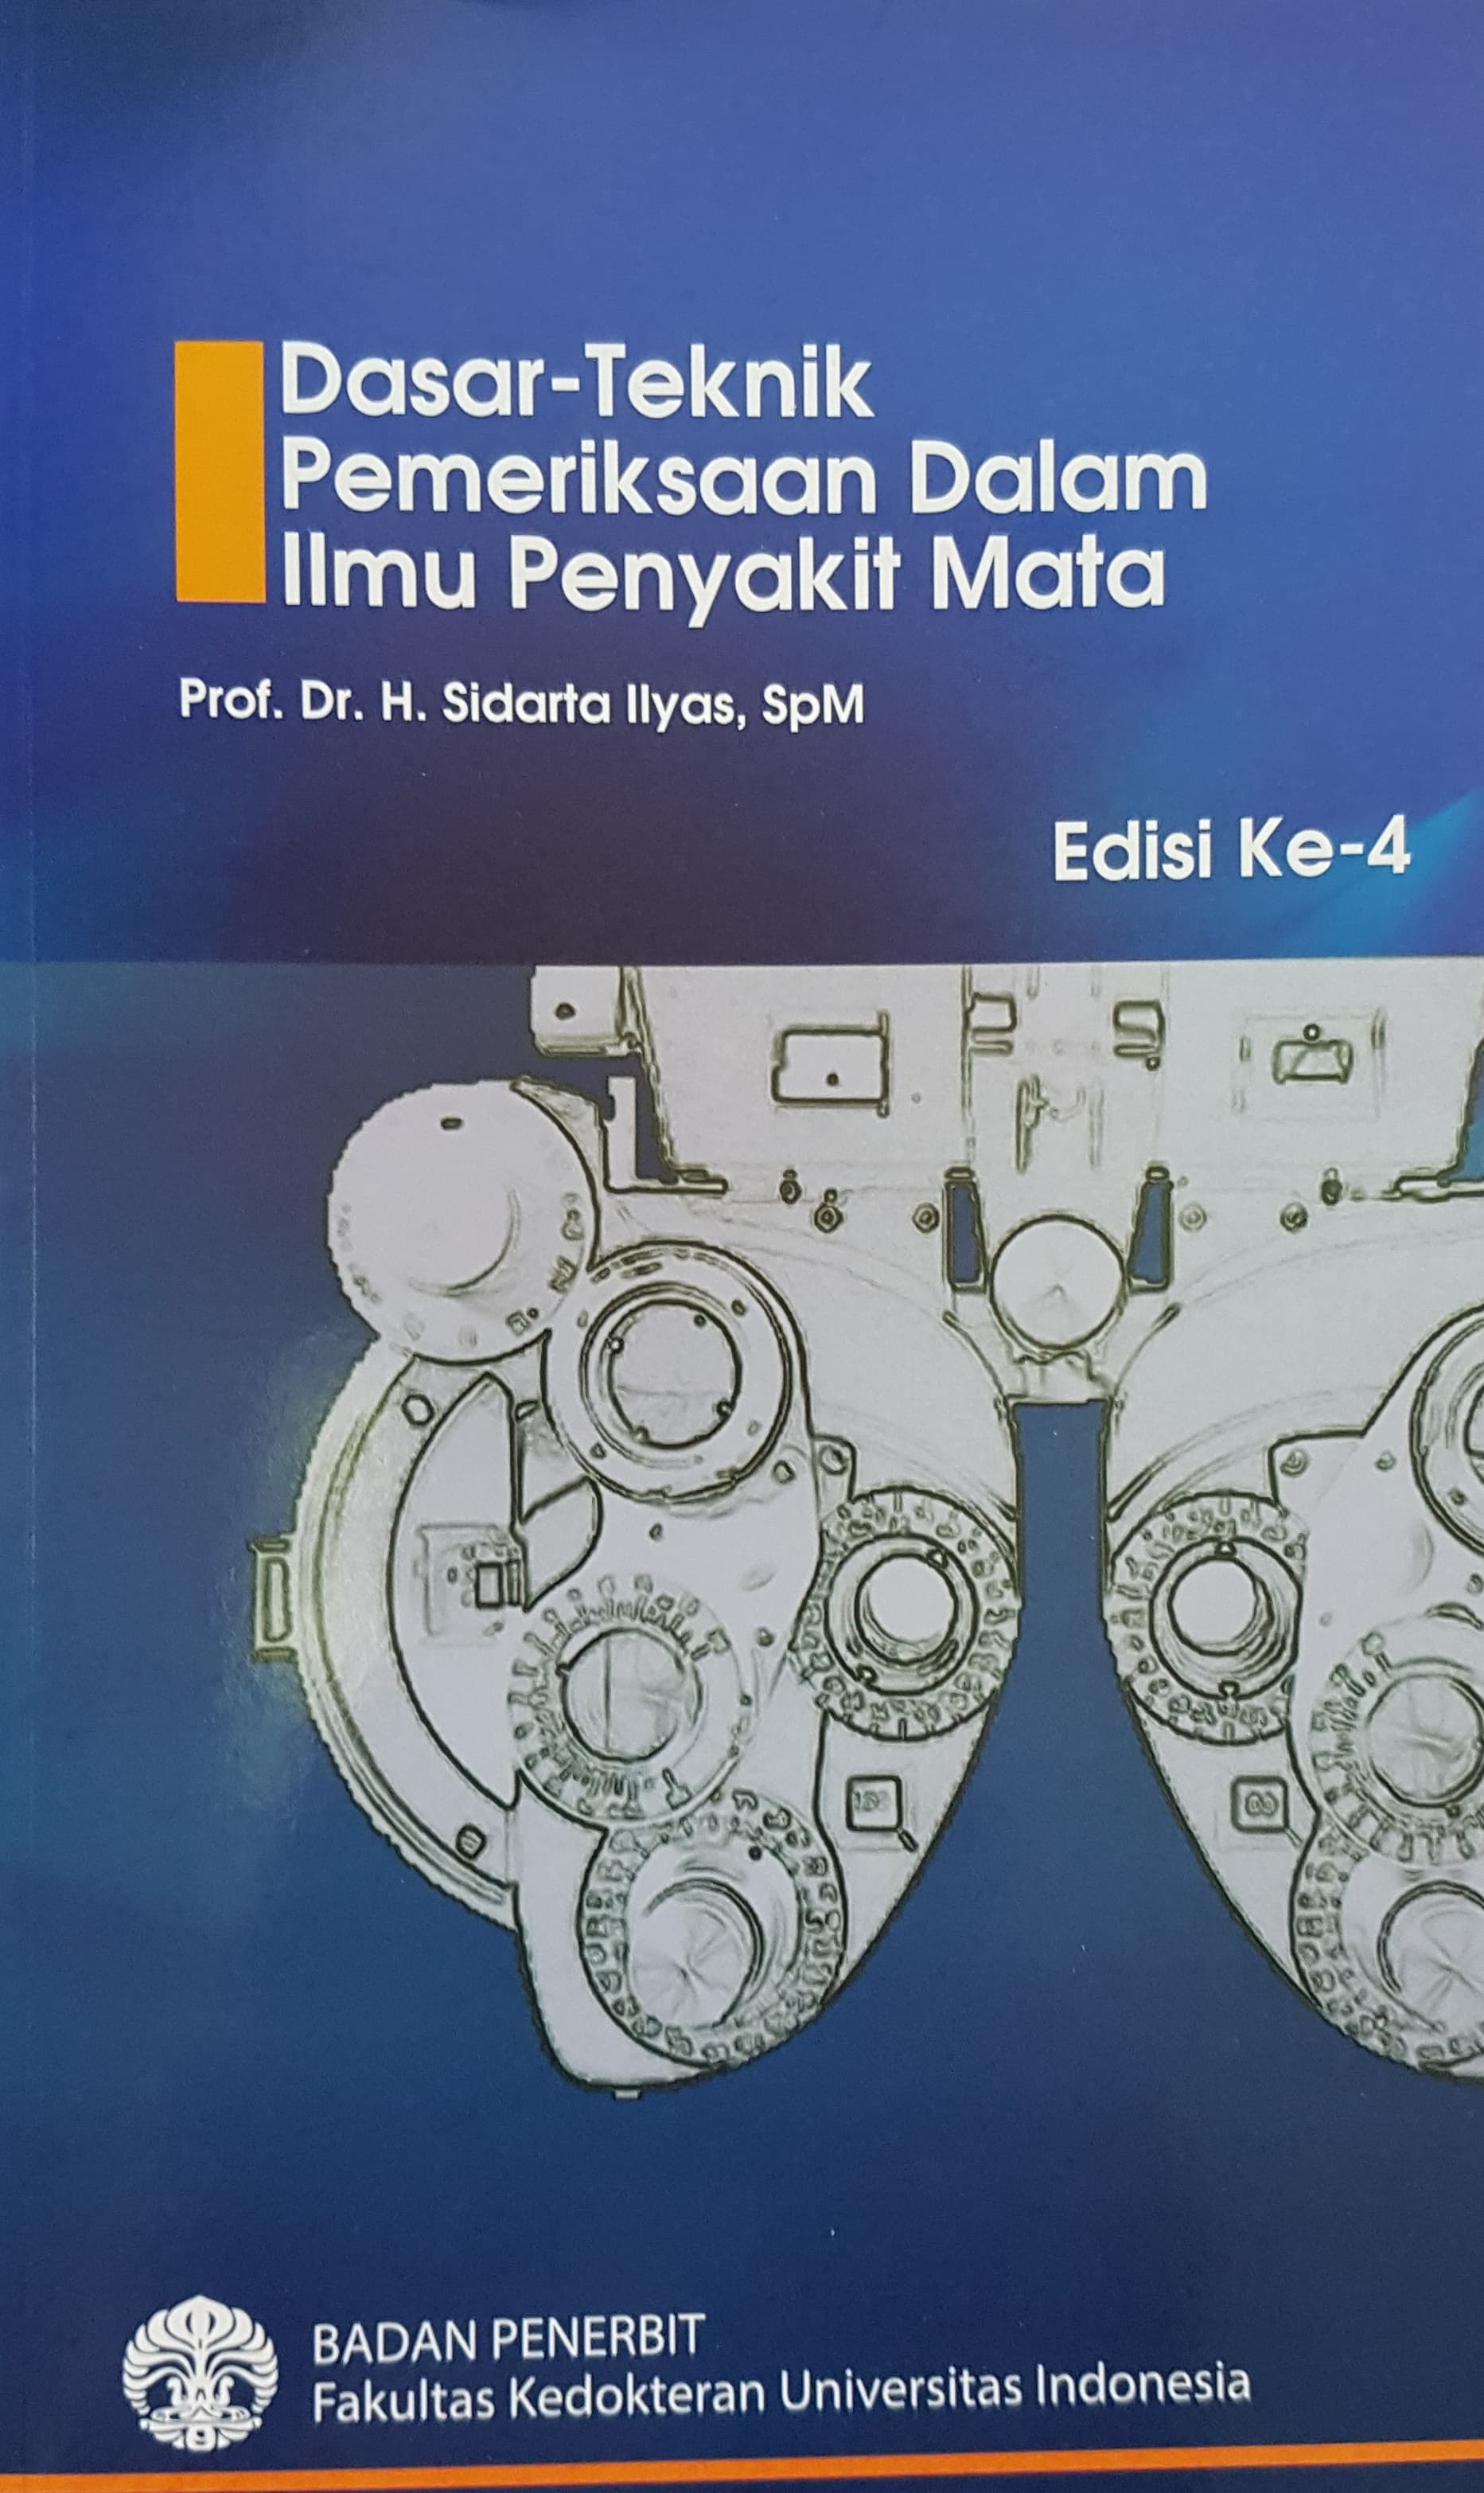 [ORIGINAL] Dasar-Teknik Pemeriksaan Ilmu P. Mata 4e - Sidarta Ilyas